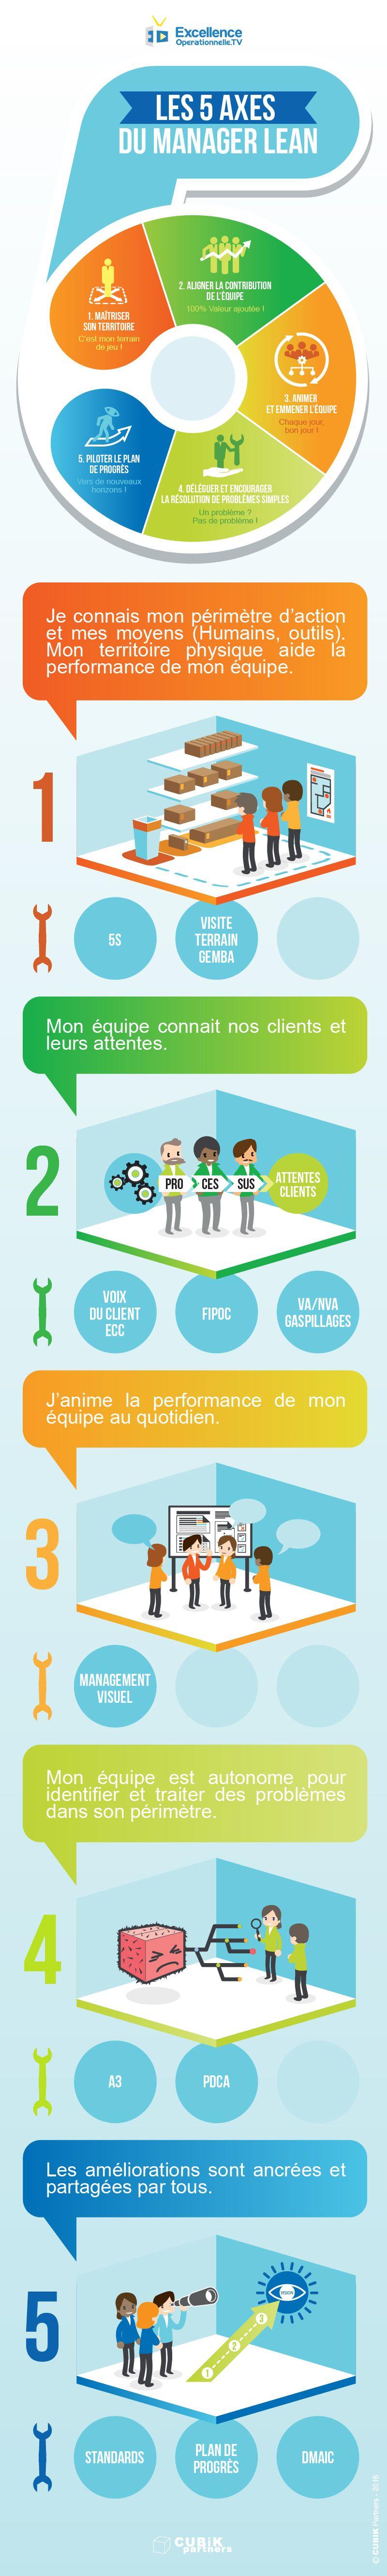 5-axes-du-Manager-Lean | gemba | Pinterest